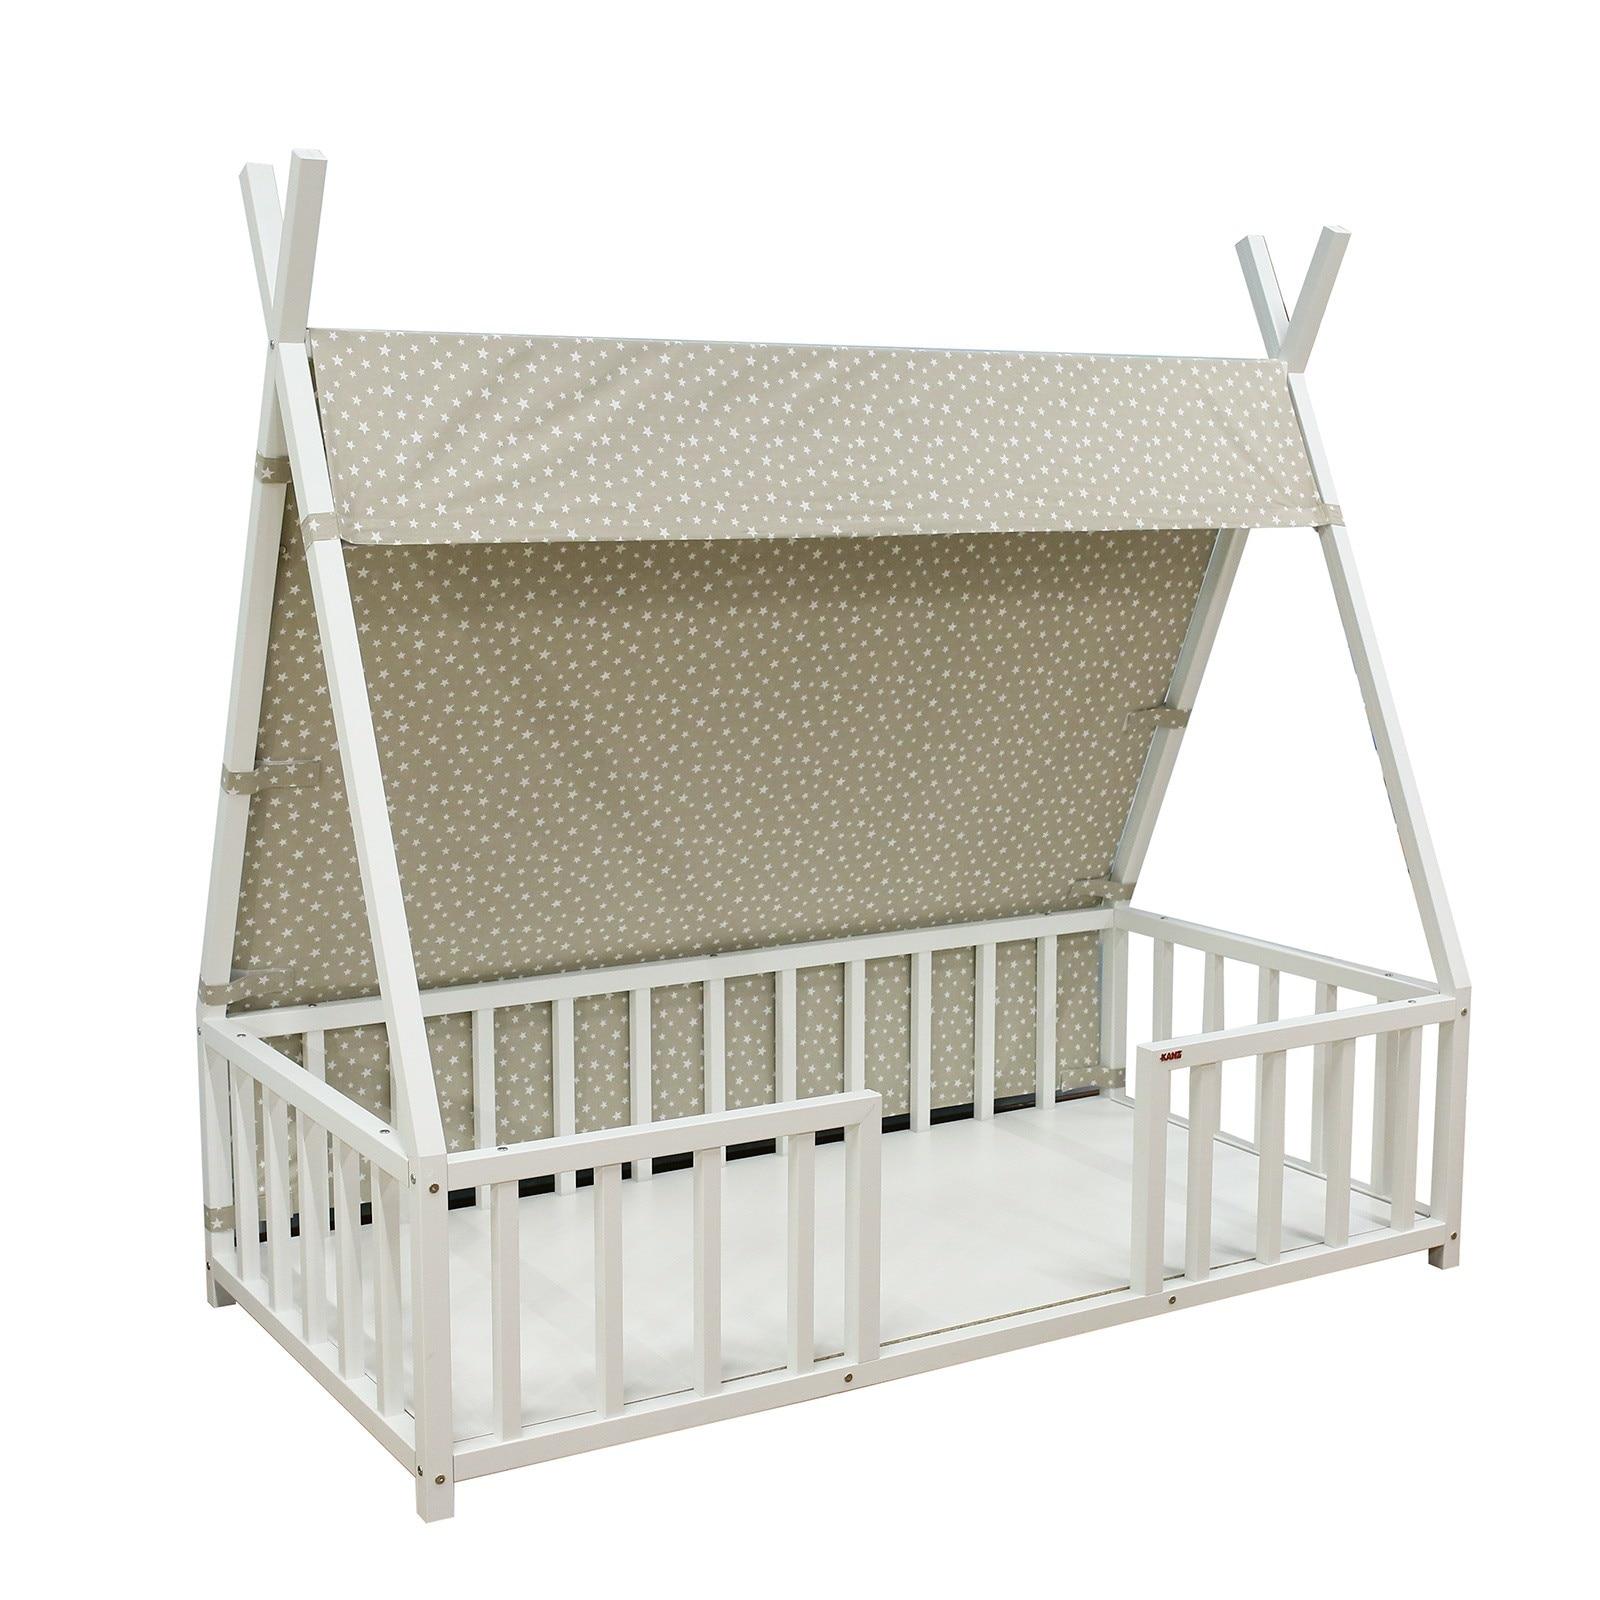 Ebebek Baby Plus Star Baby Crib Shade